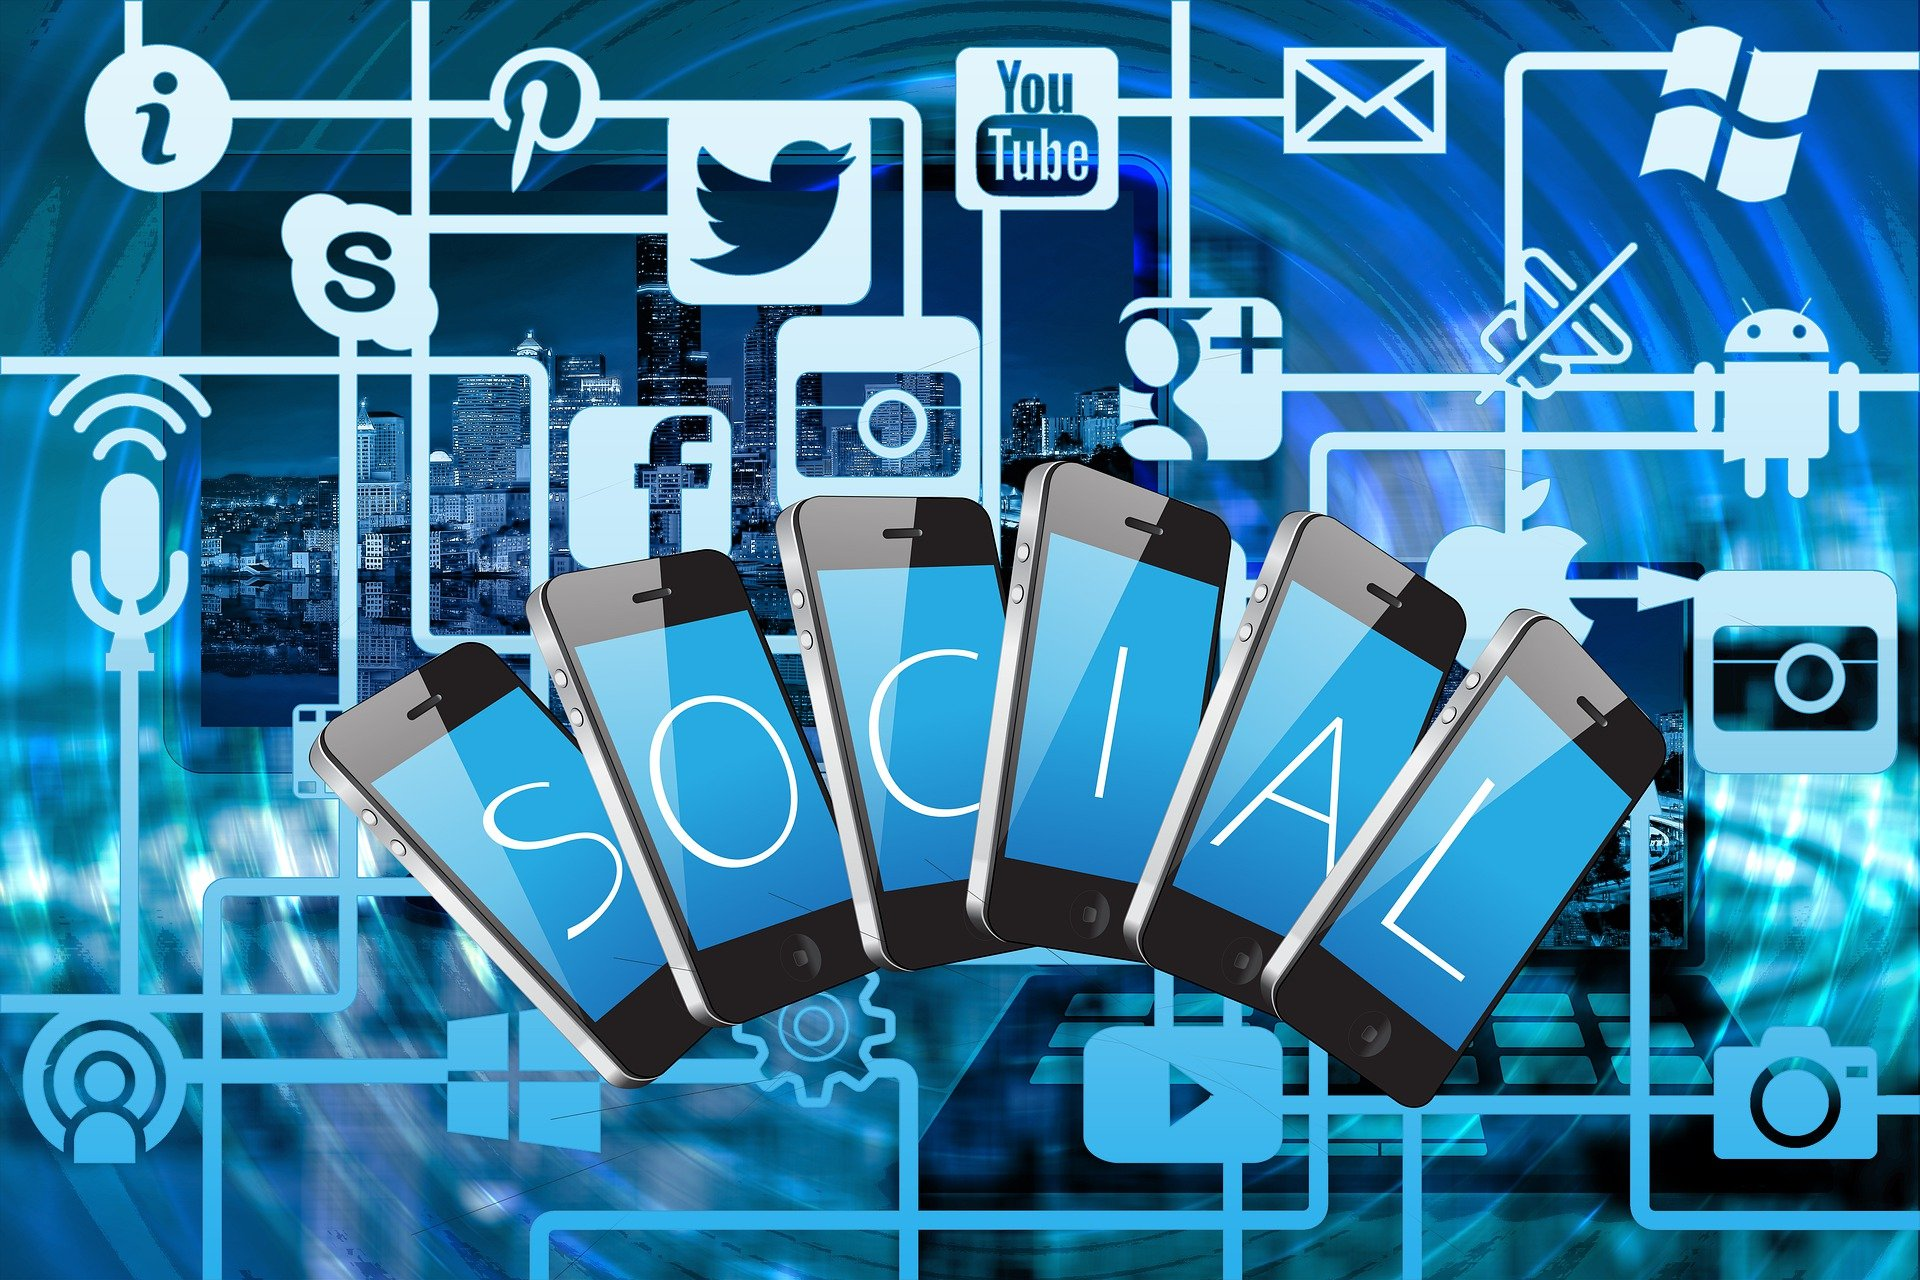 social media identity theft